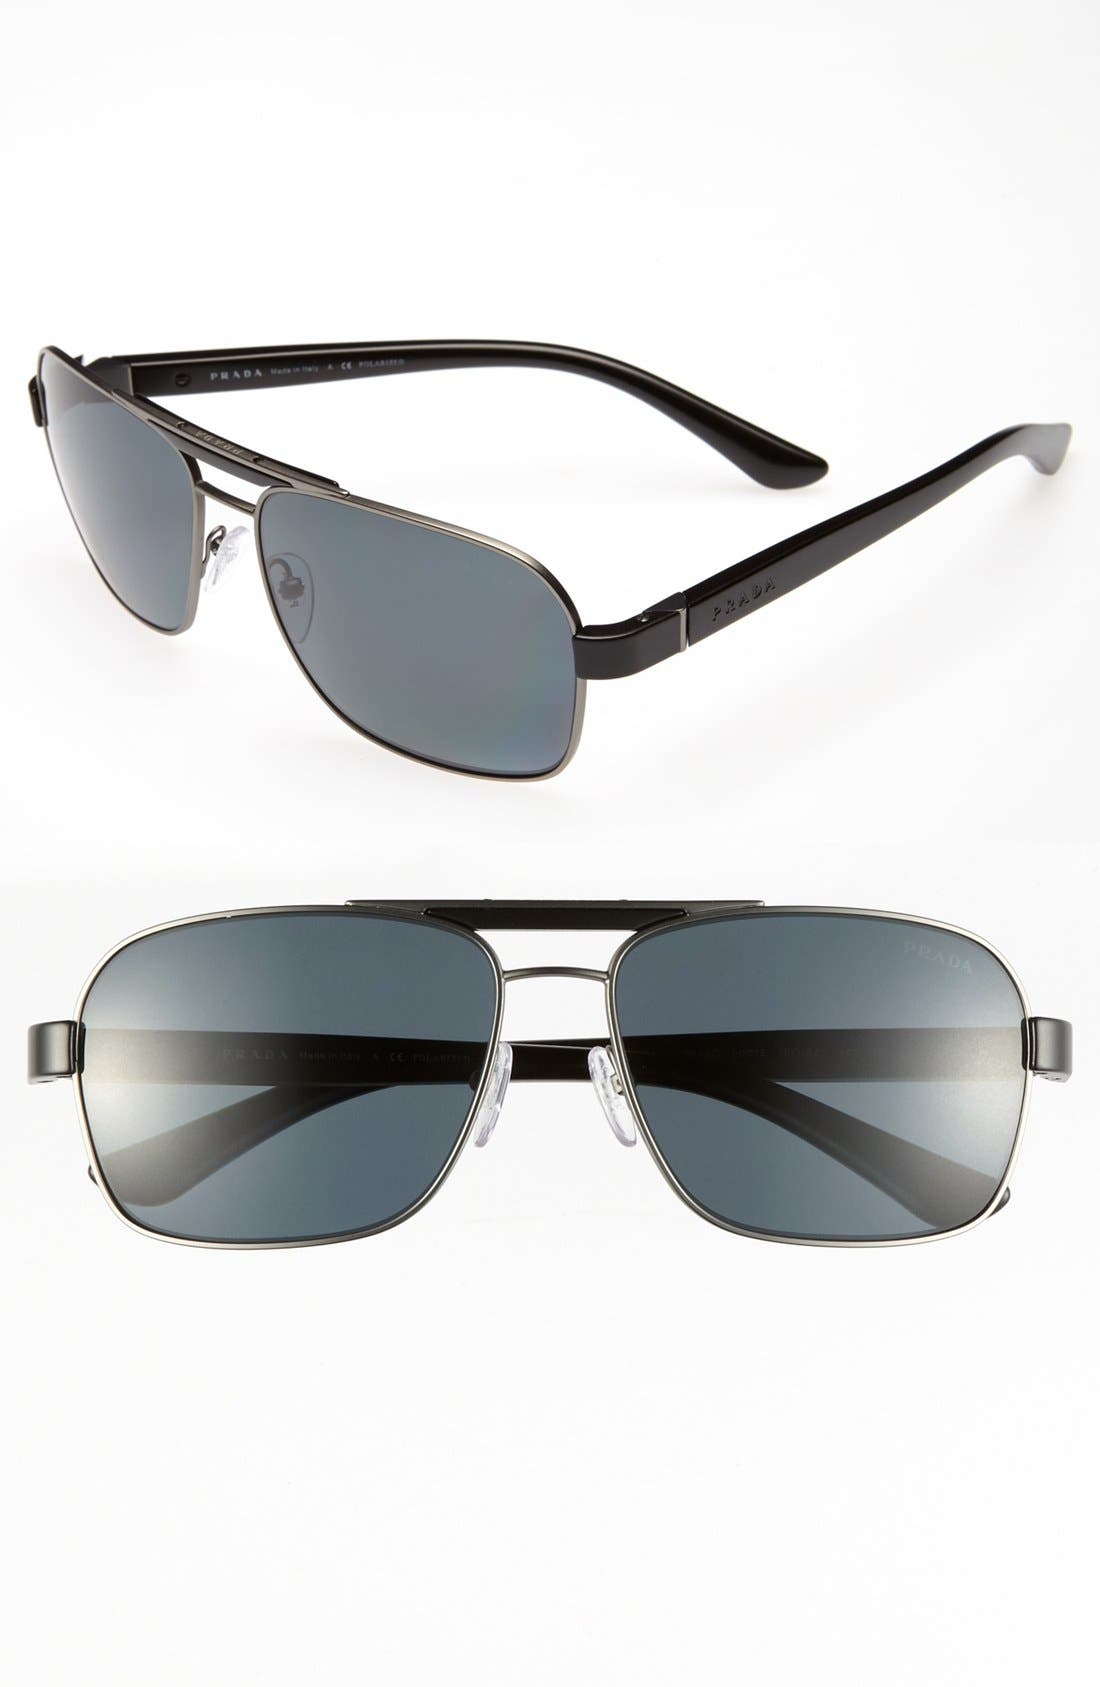 Alternate Image 1 Selected - Prada 60mm Polarized Retro Sunglasses